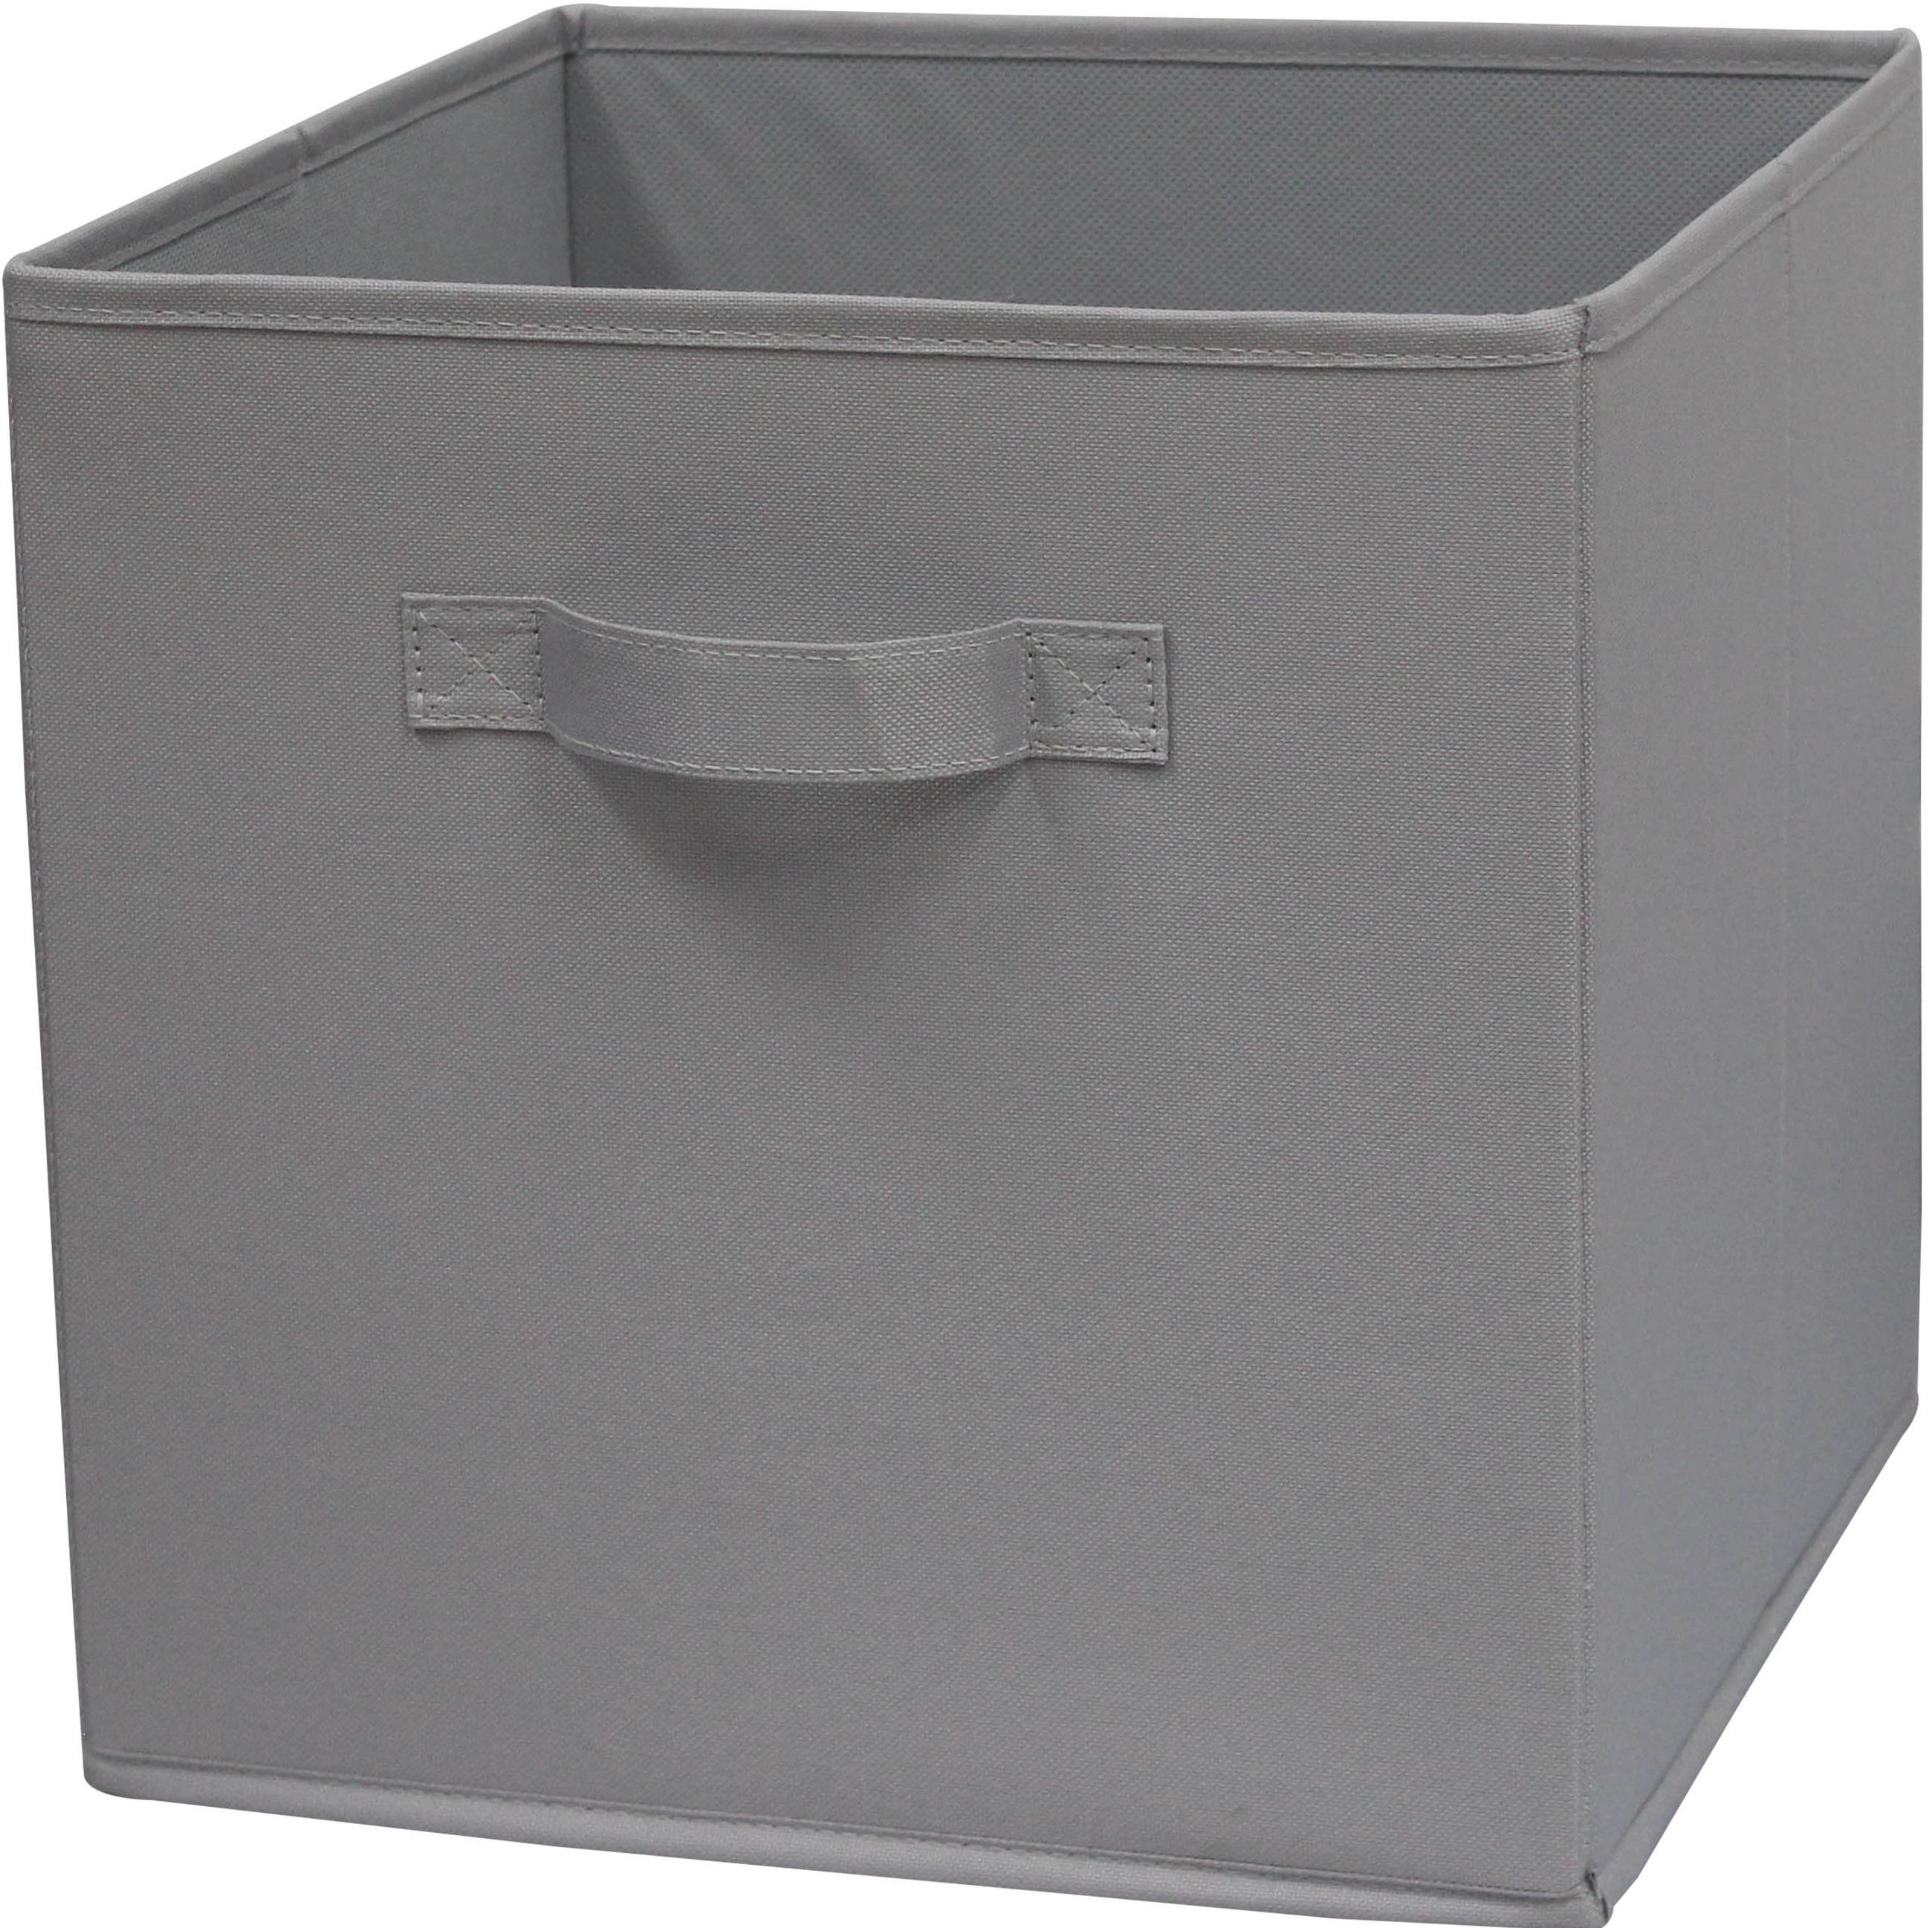 Короб Spaceo Granit, 310х310х310 мм, 29.7 л, полиэстер, цвет серый